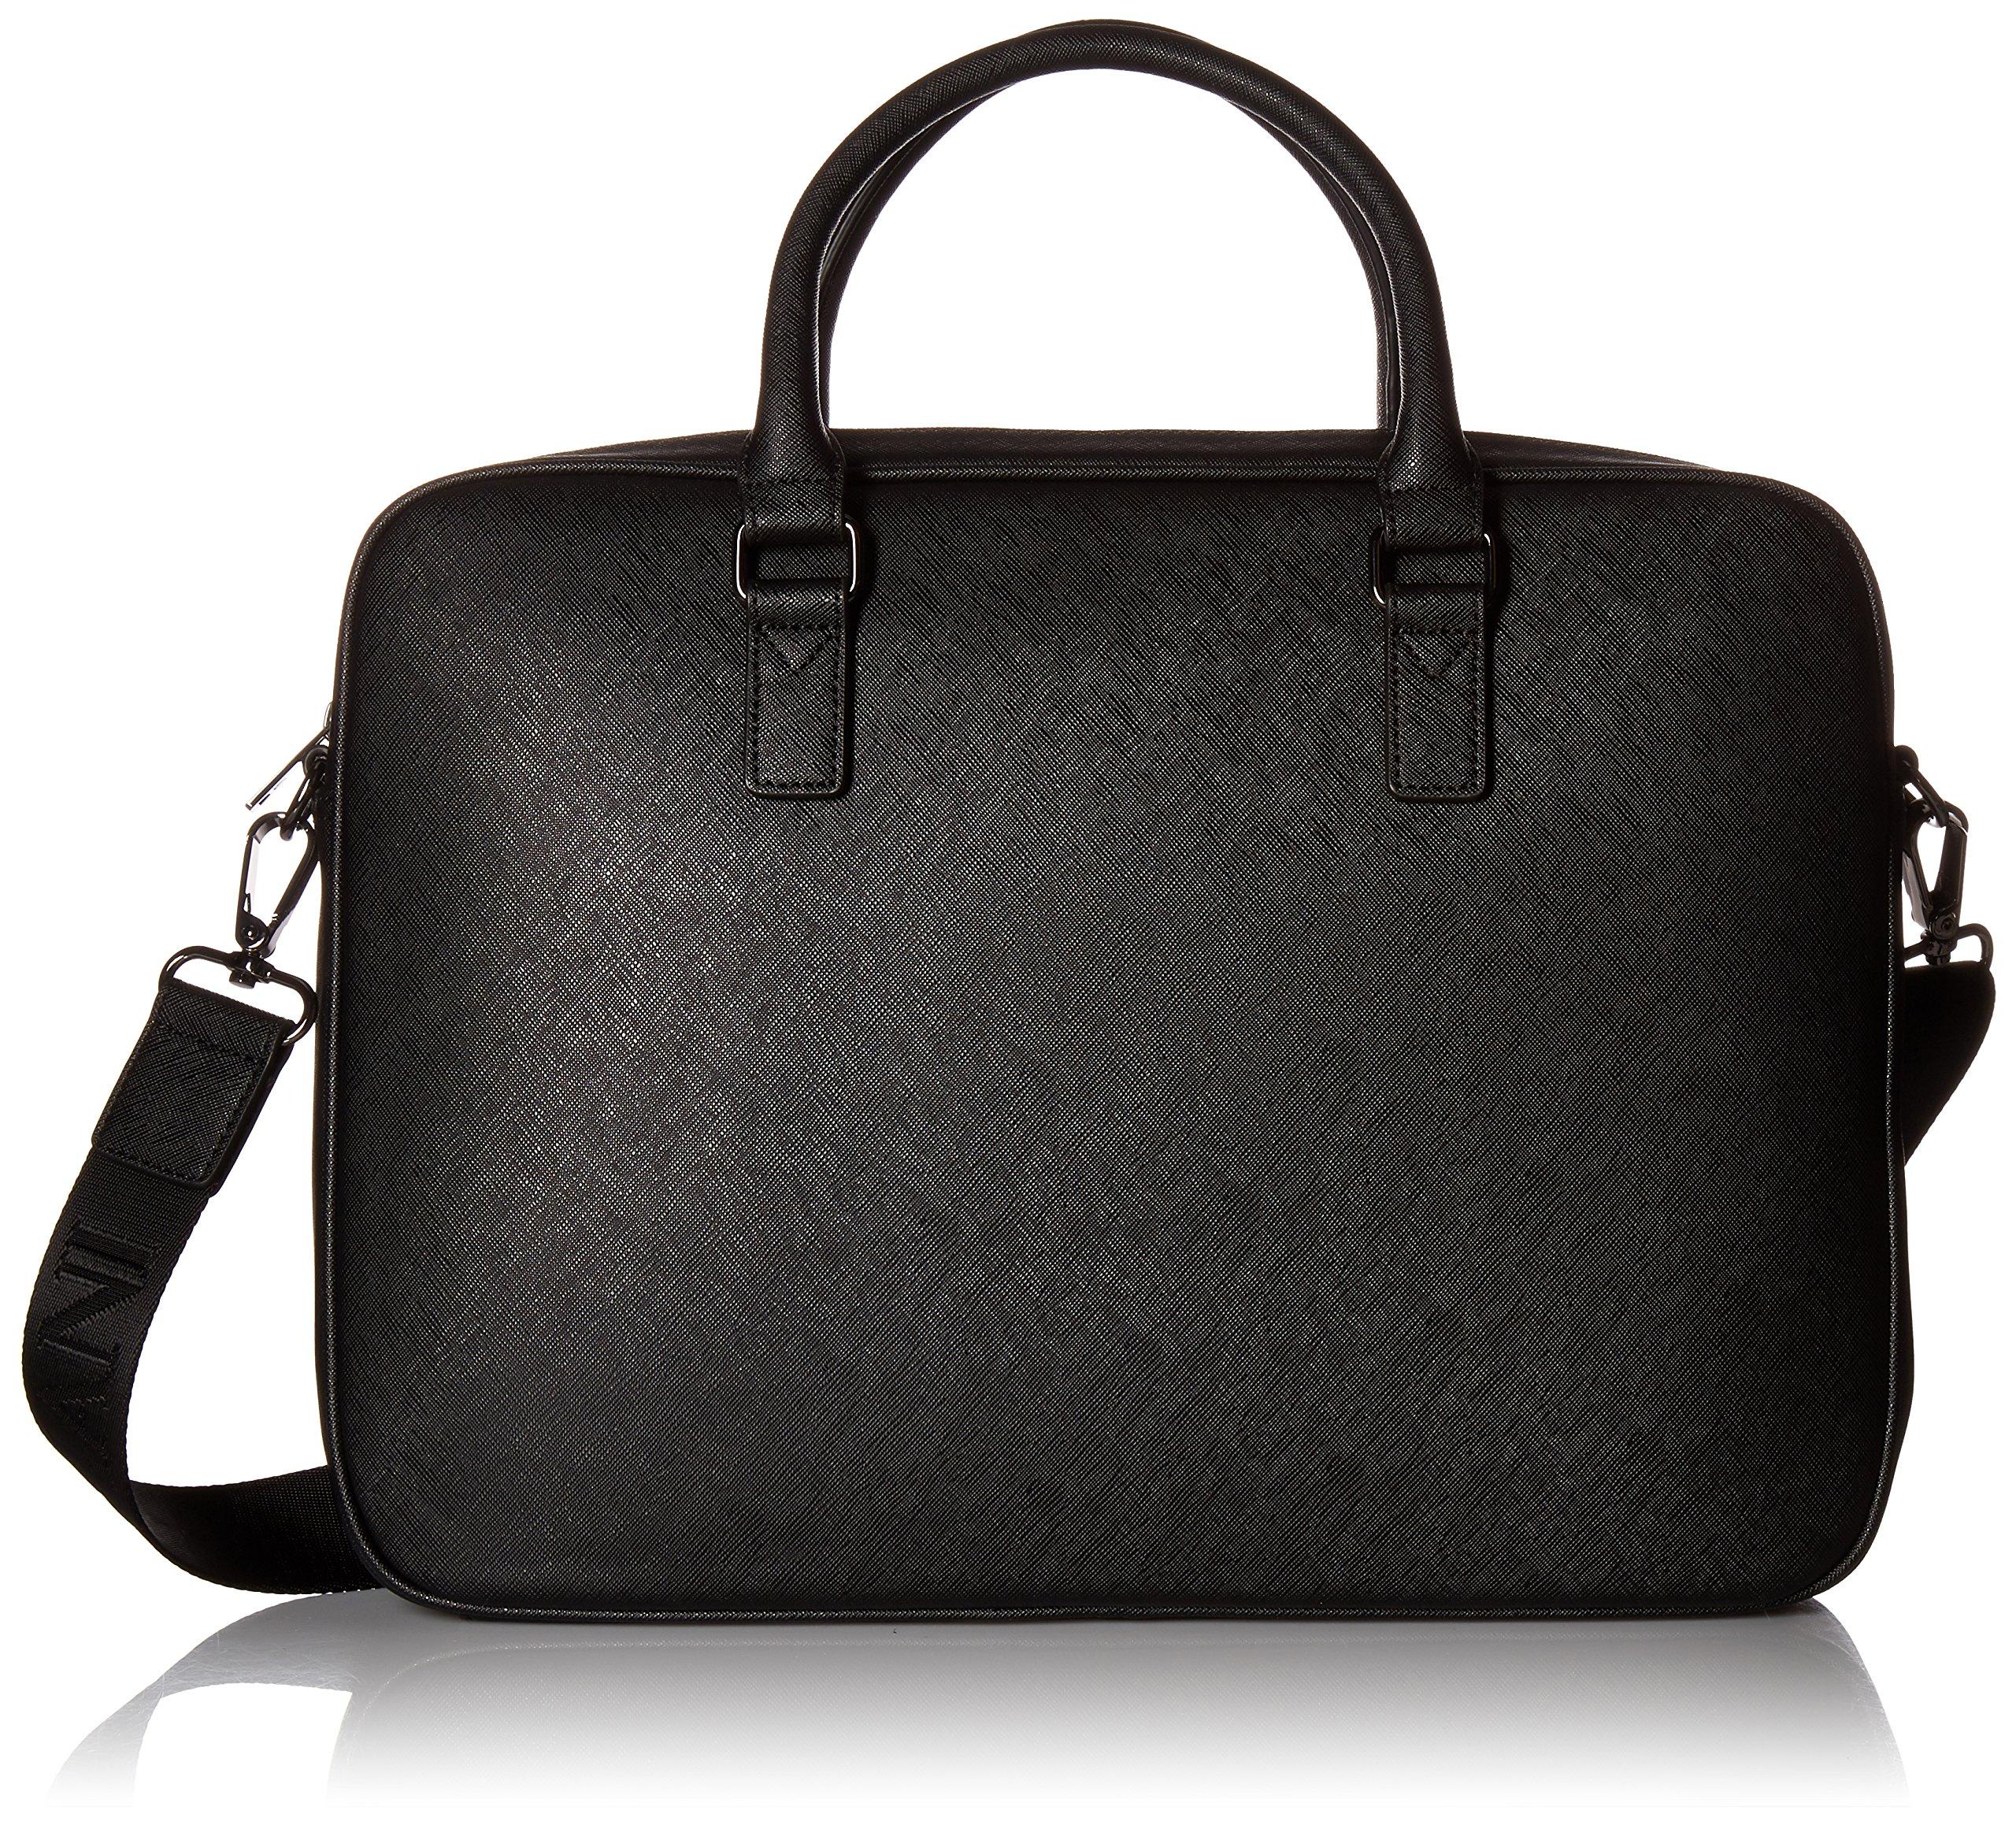 Armani Exchange Men's Saffiano Embossed Briefcase, Black